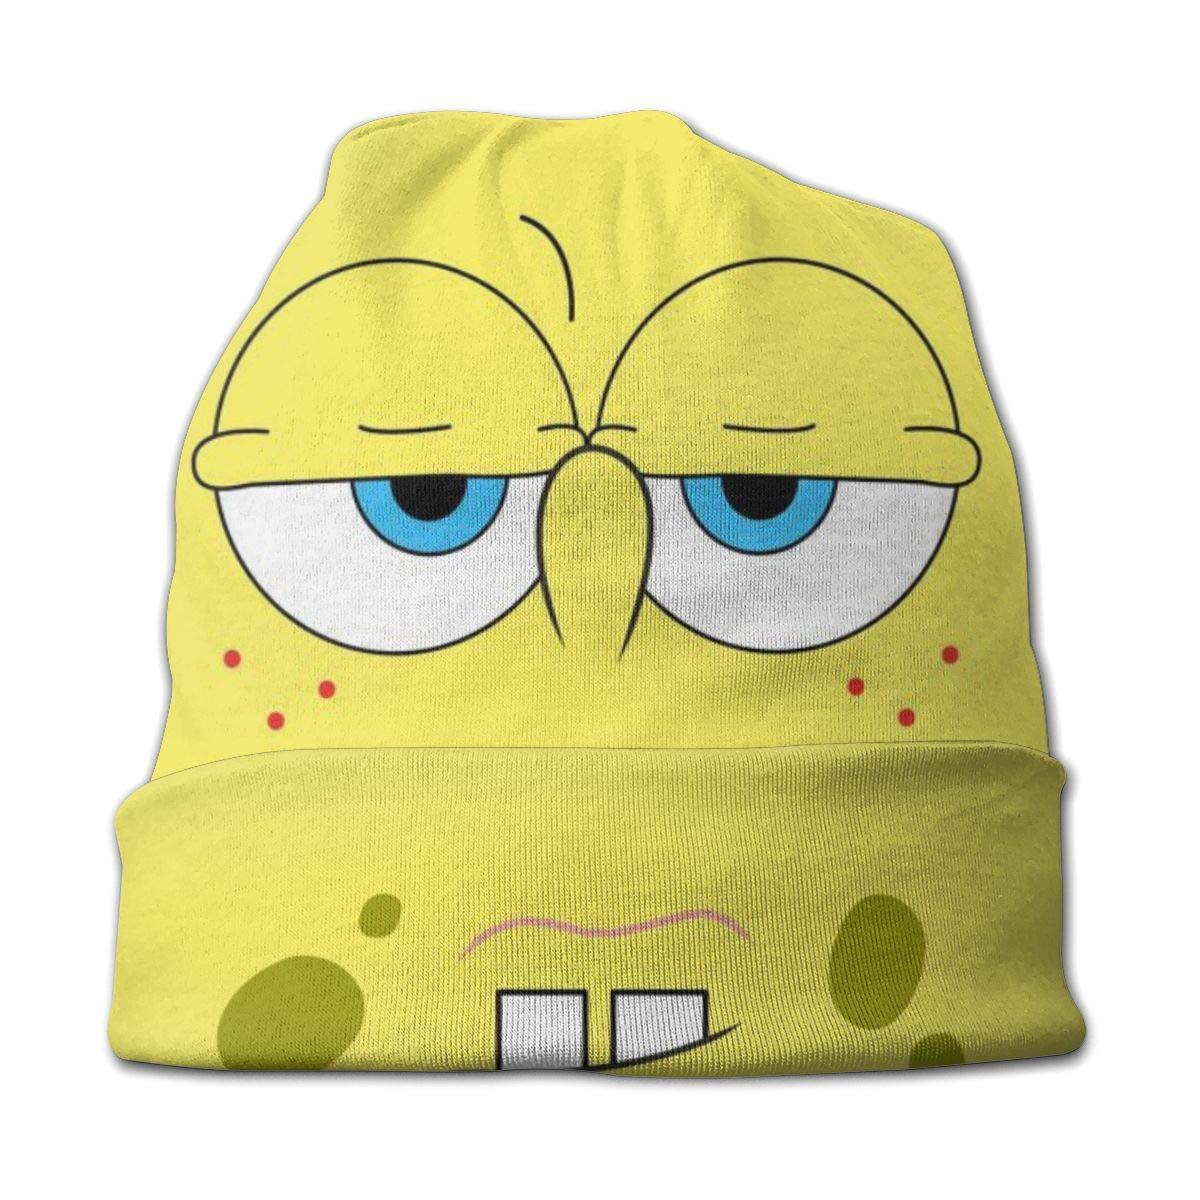 Amstores Novelty Cartoon Graphic Kids Girls Boys Beanie Thin Knit Hat